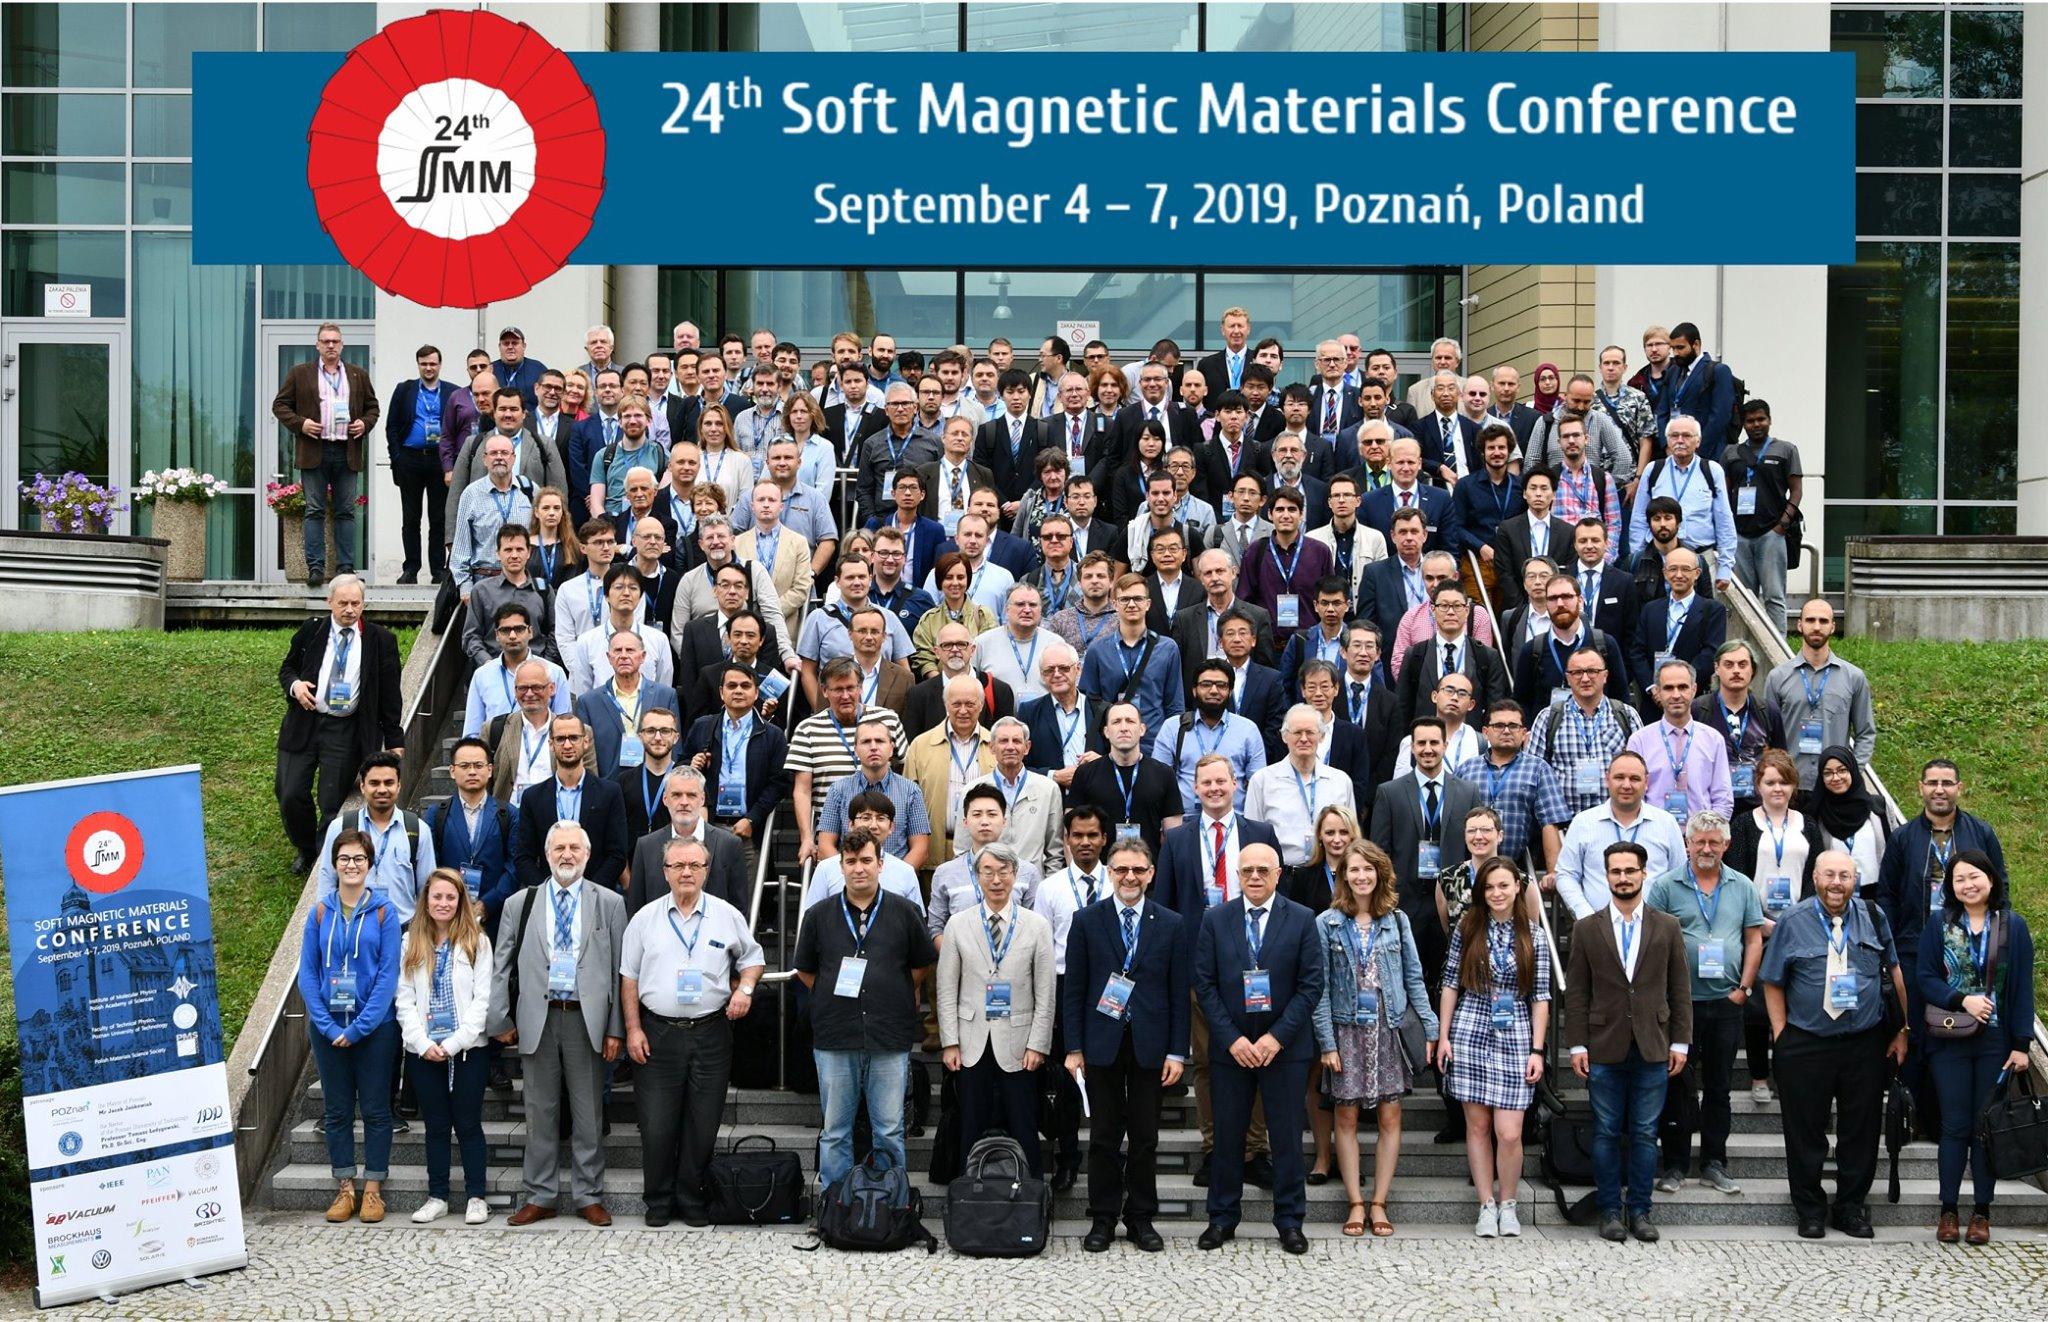 軟磁性材料会議に出席